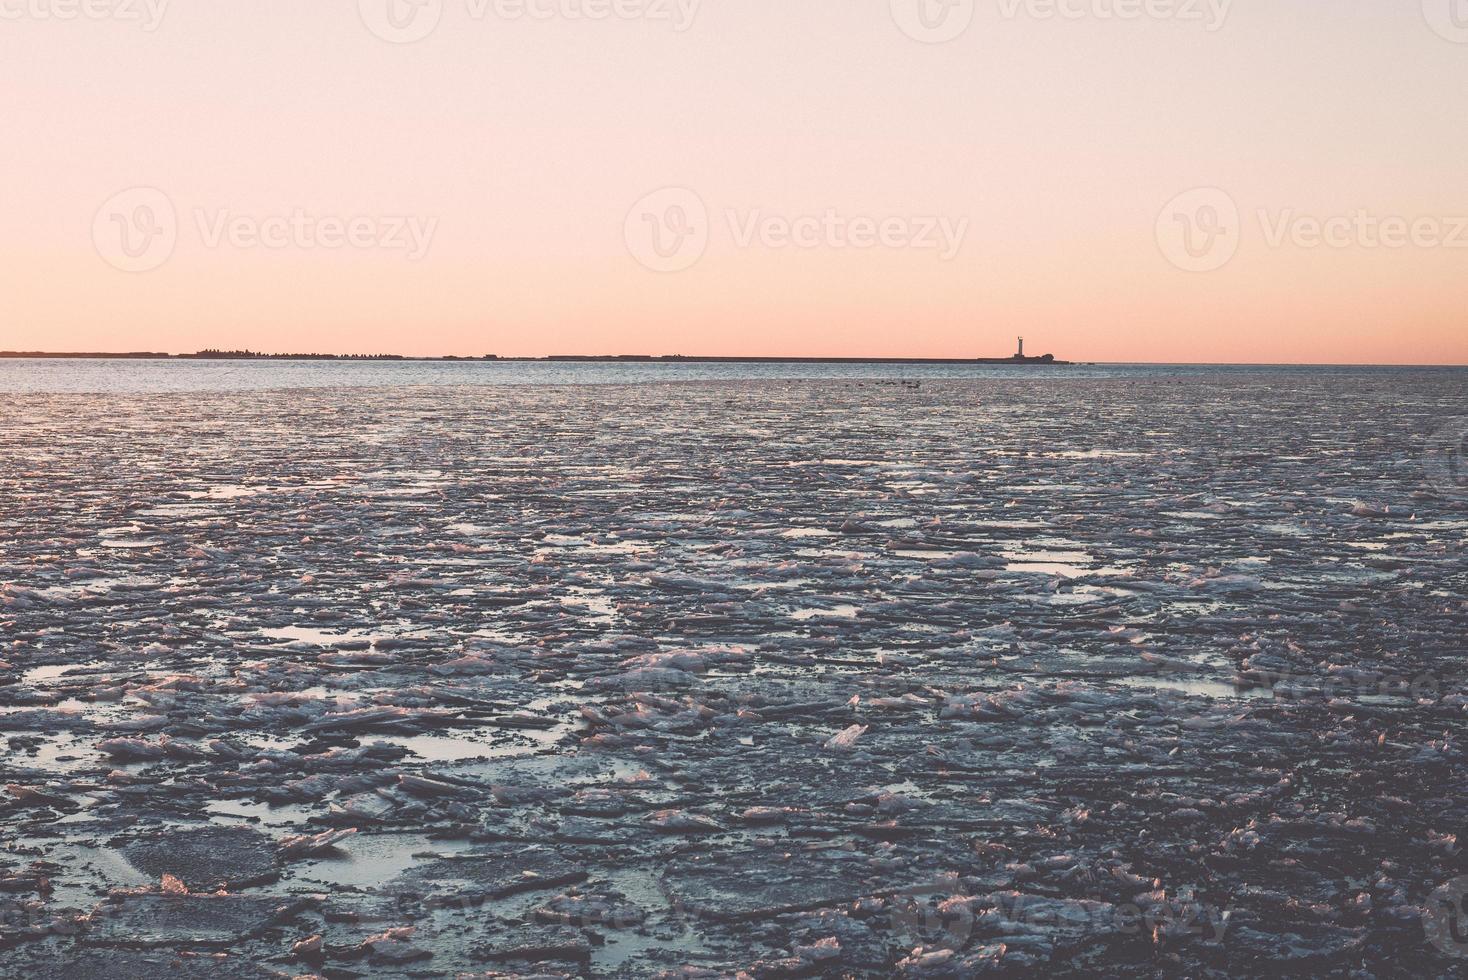 sunset over frozen sea - vintage retro effect photo